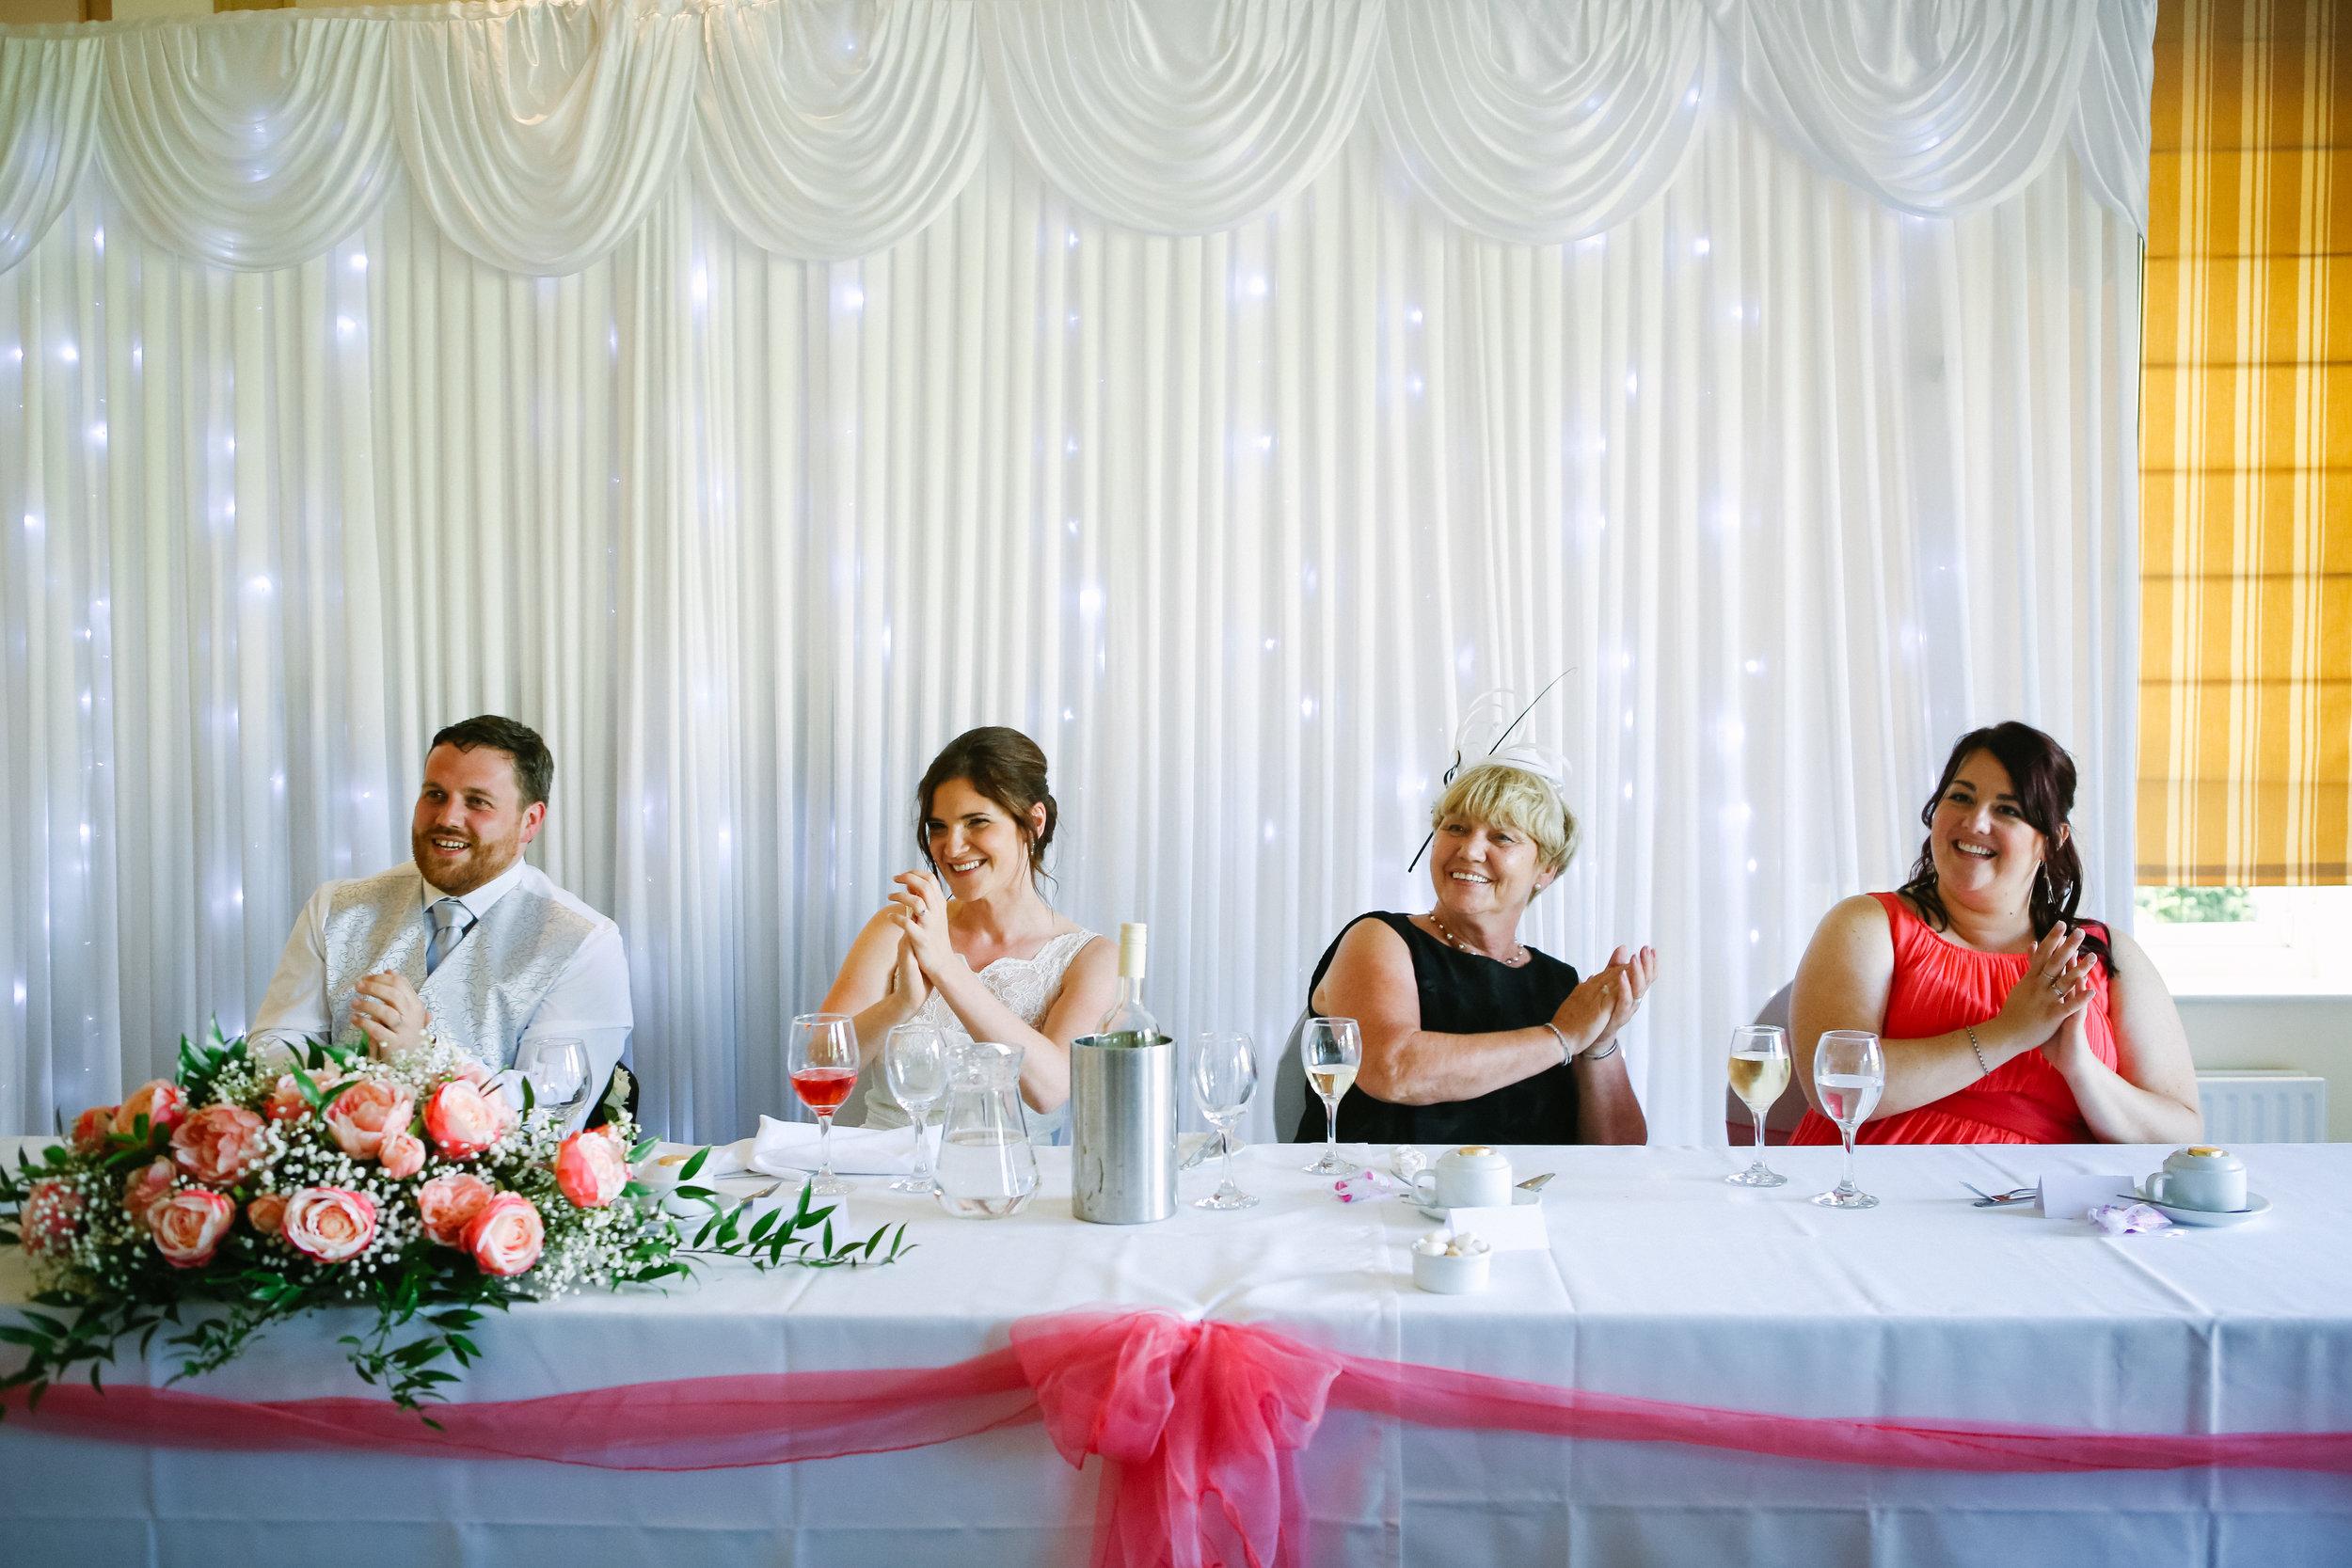 reigate-surrey-london-wedding-photography-group-formal-shot-reception-woldingham-golf-club-singing-waiter-85